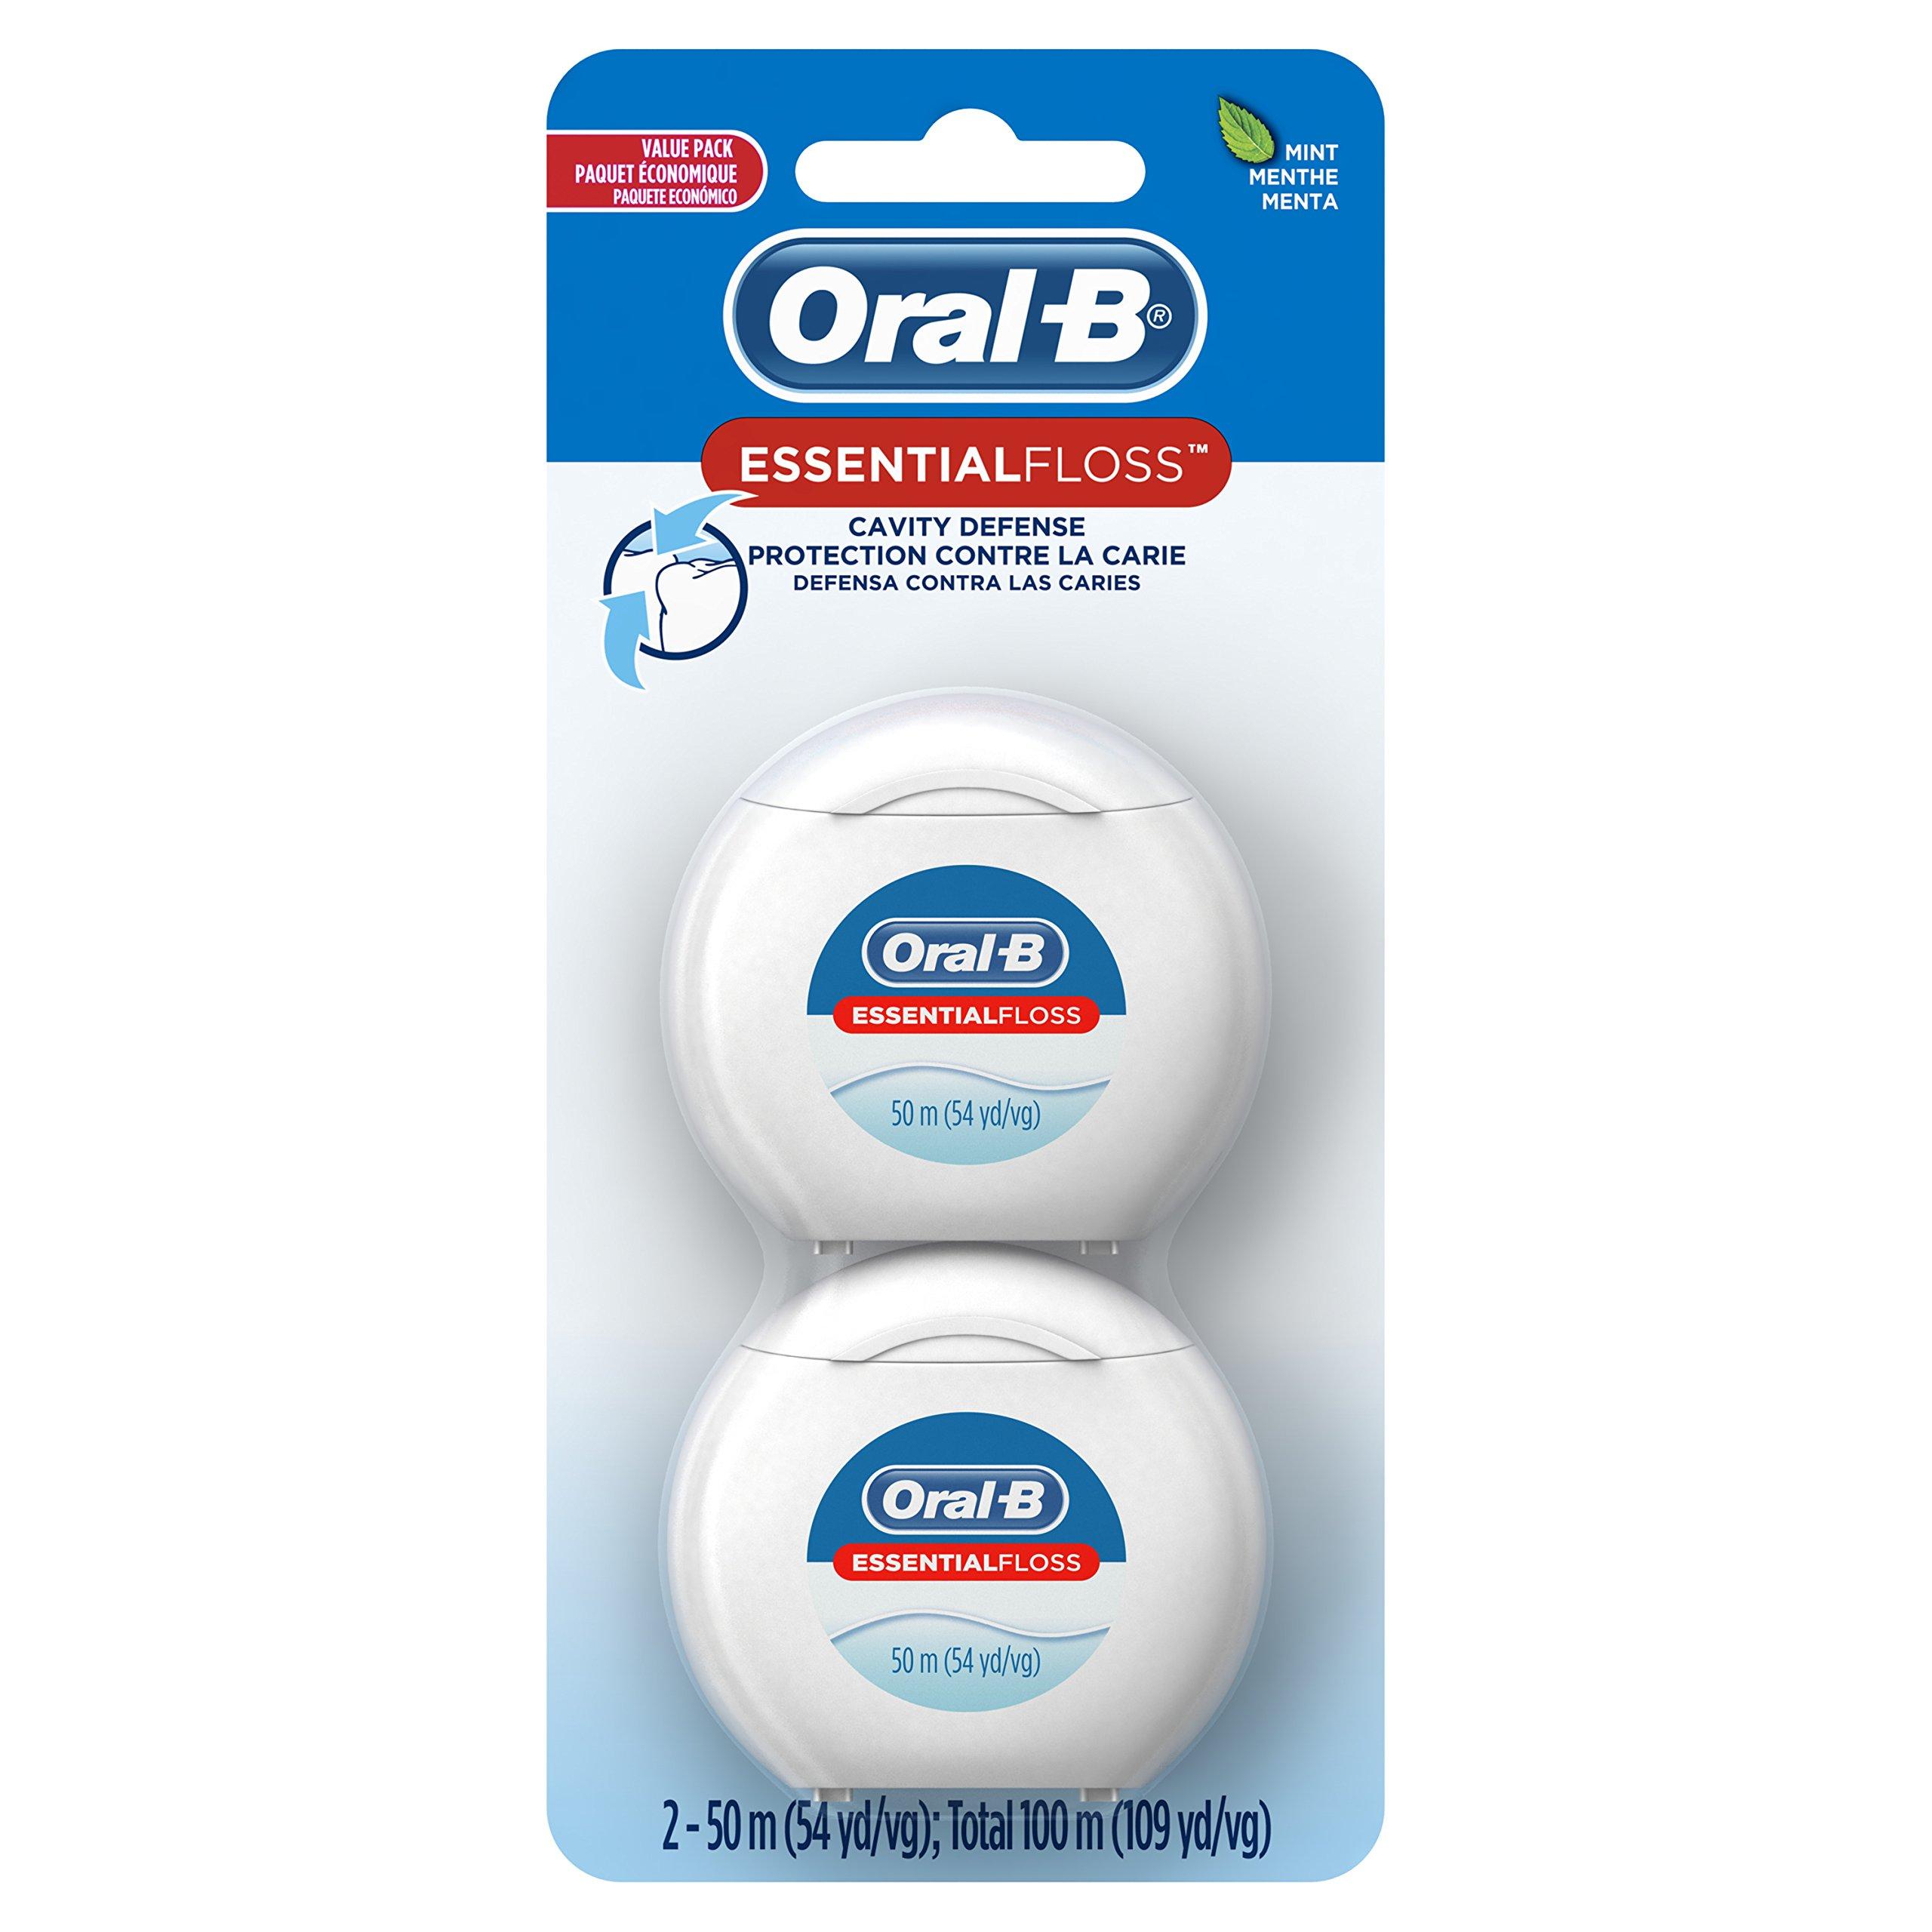 Oral-B EssentialFloss Cavity Defense Dental Floss, 50 M, Pack of 2